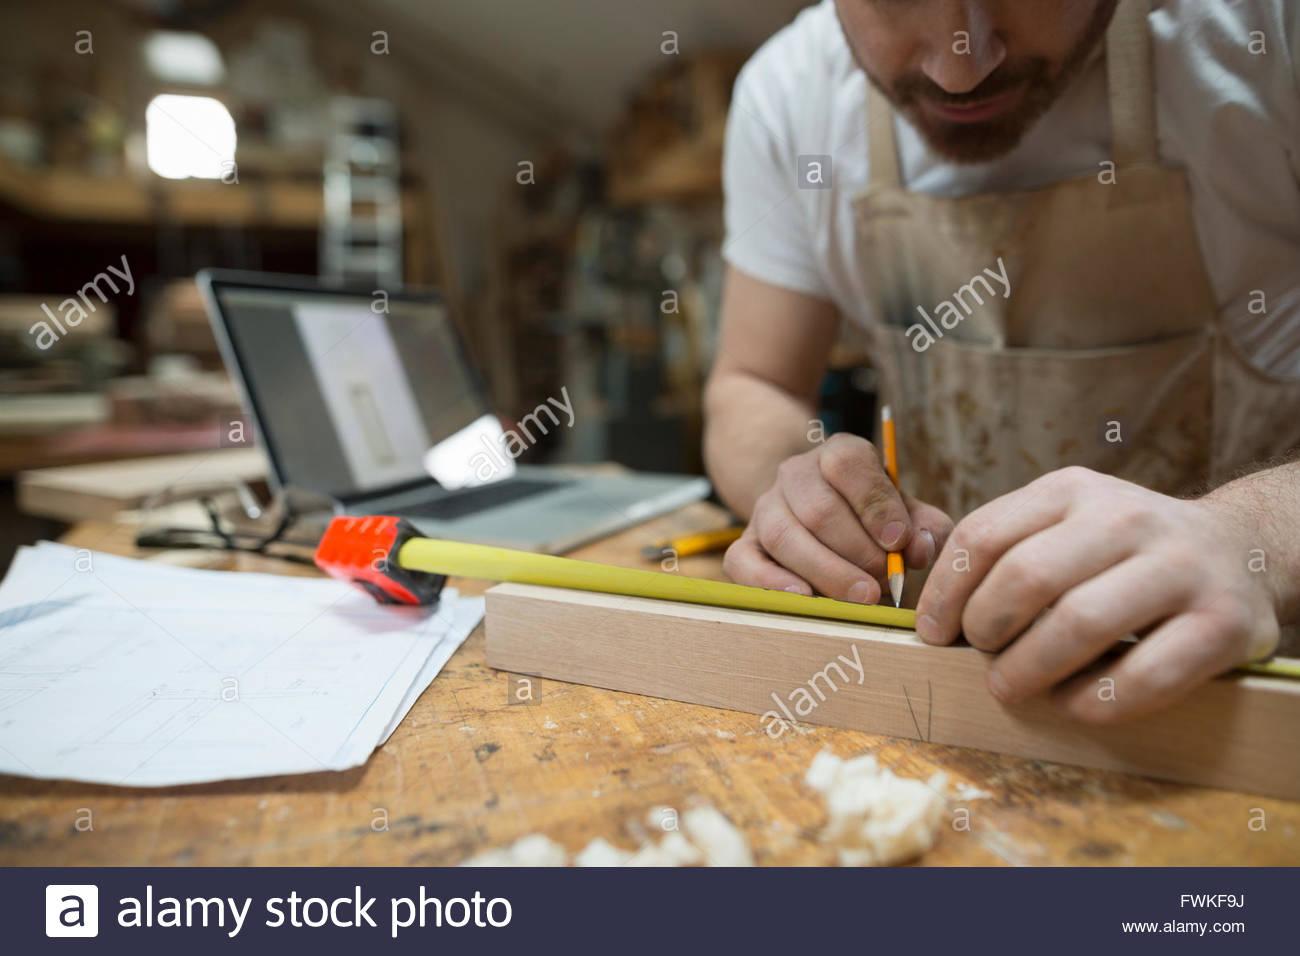 Carpenter measuring cale en bois en atelier Photo Stock